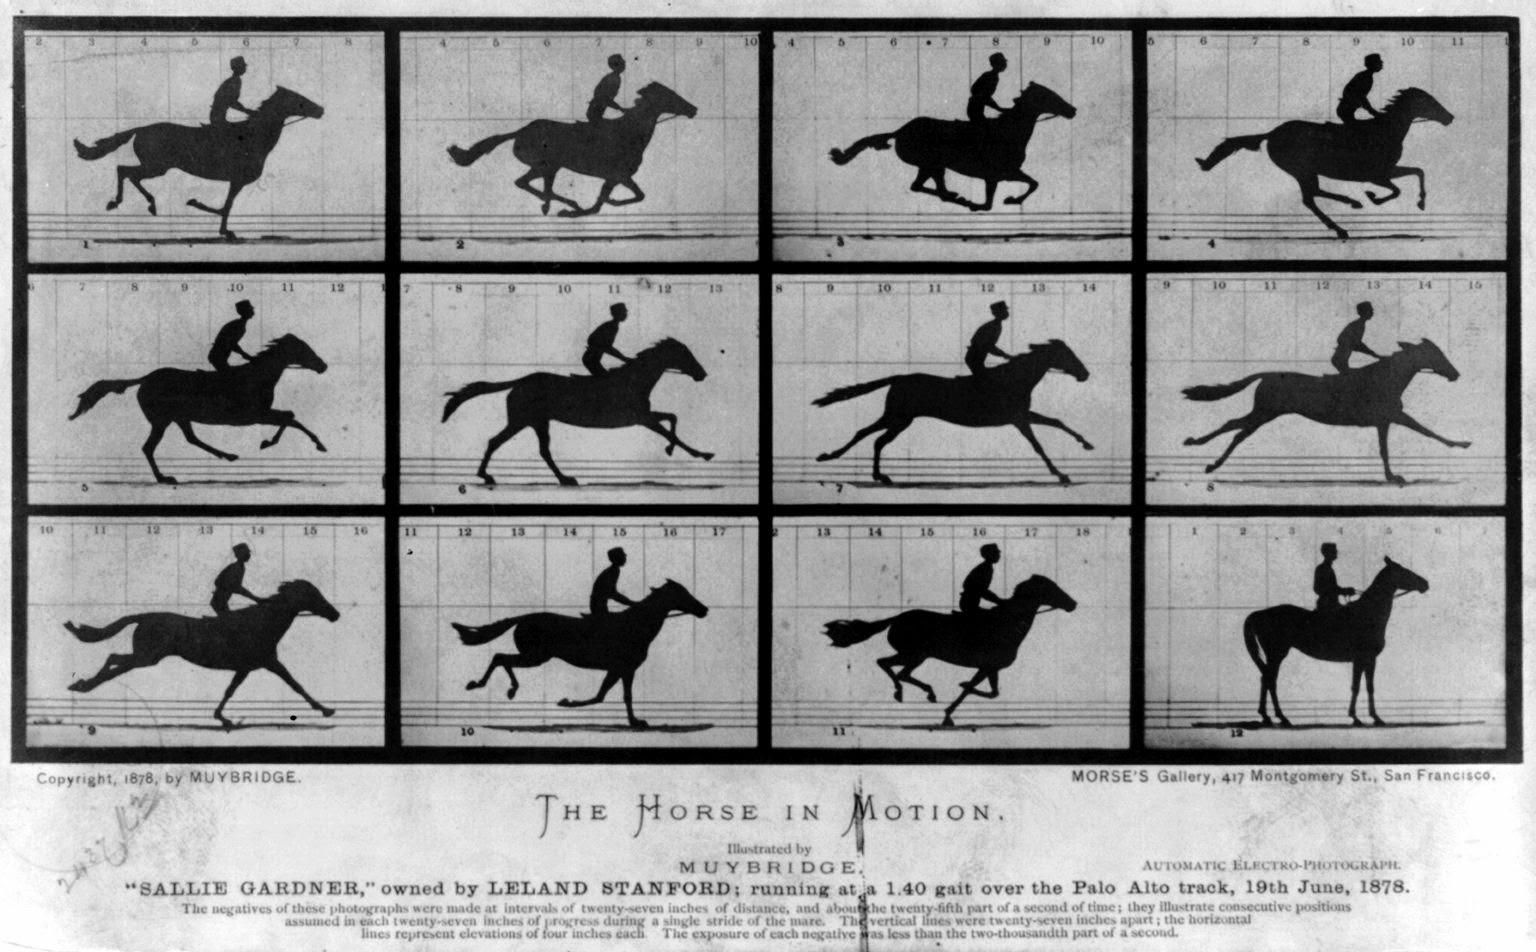 secuencia del galopar de un caballo de Eadweard Muybridge